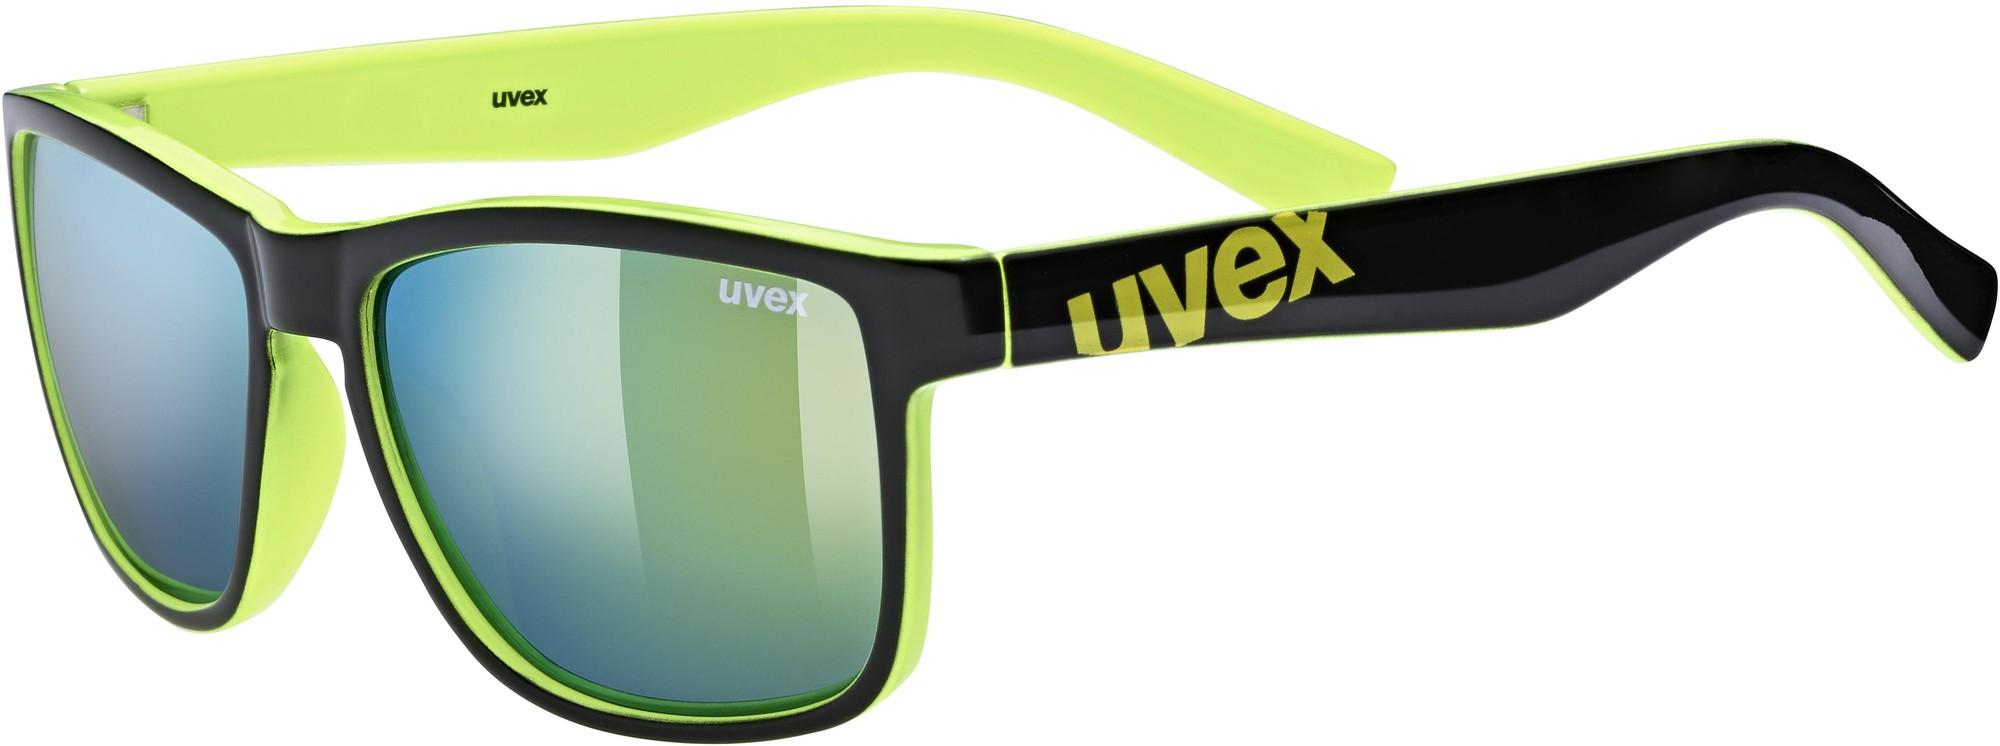 Uvex Солнцезащитные очки Uvex LGL 39